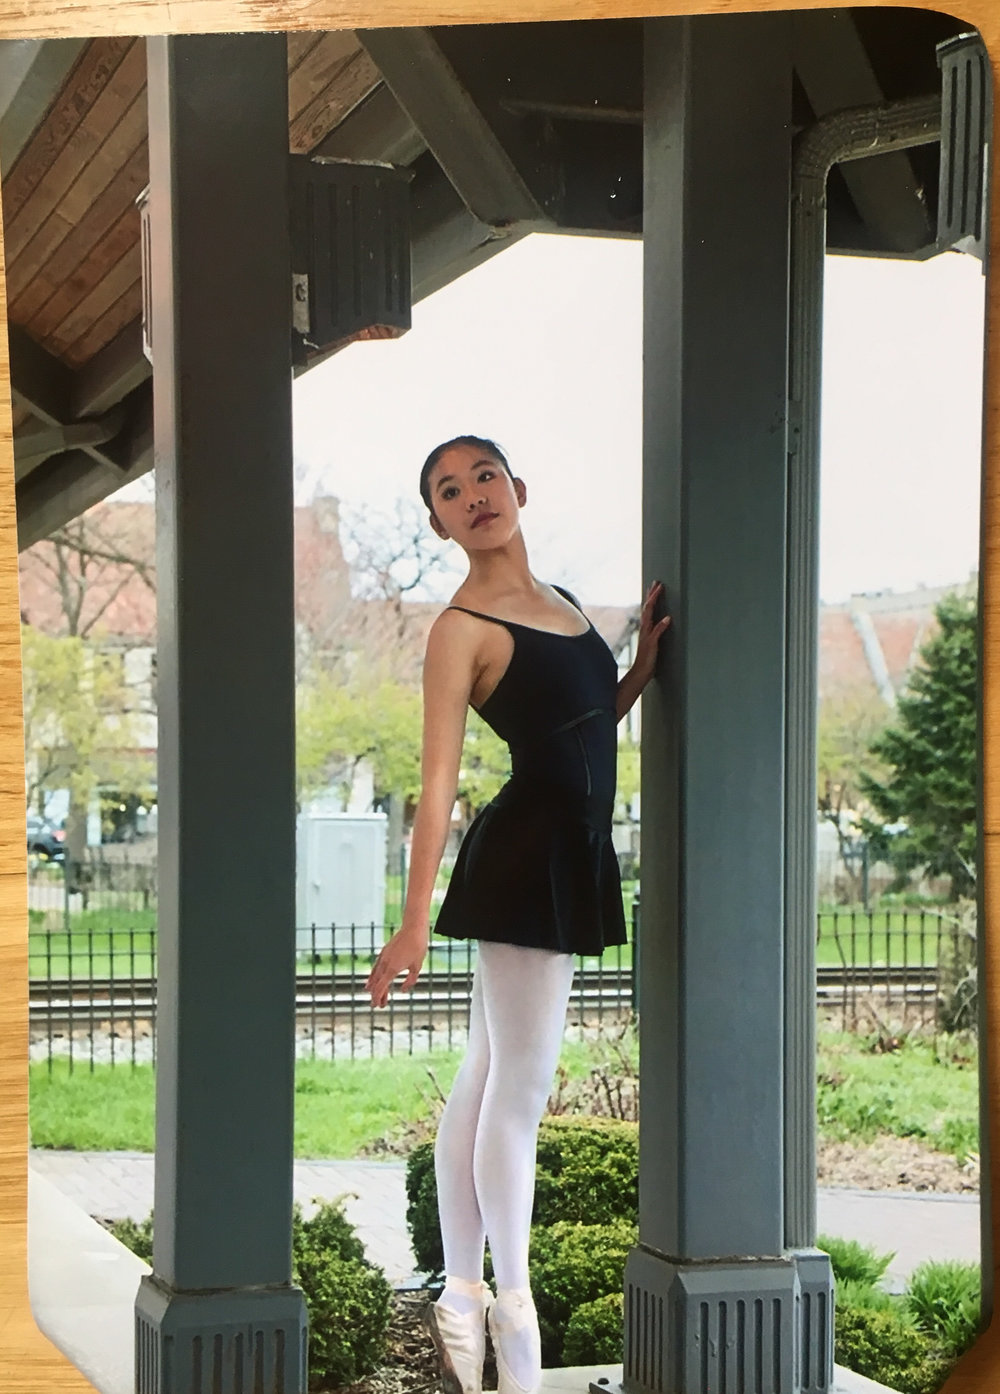 Ballerina_Hobbies_Influence